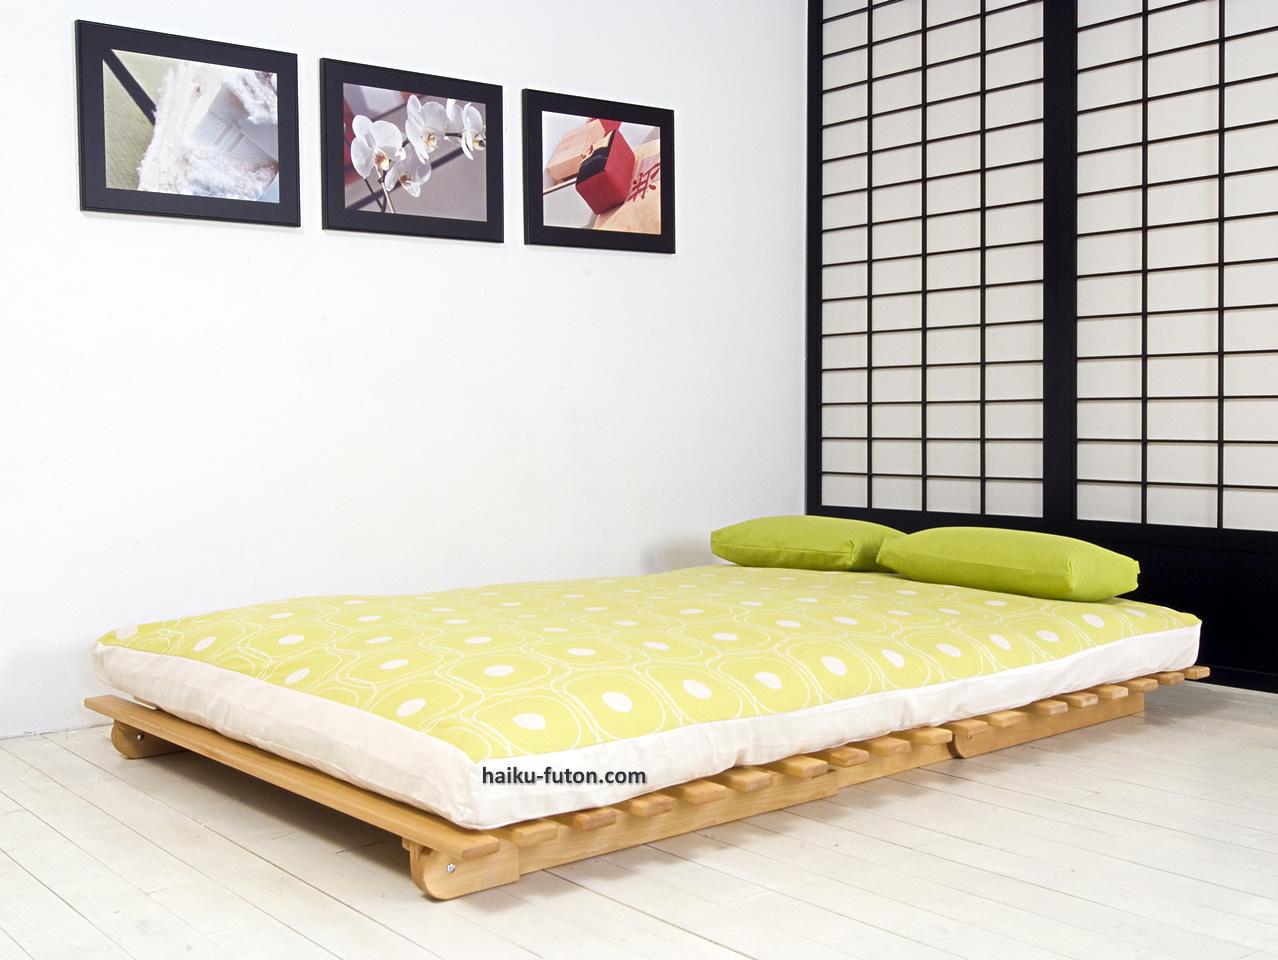 fundas para un sofa cama lacrosse sleeper futon sofá plegable  de madera